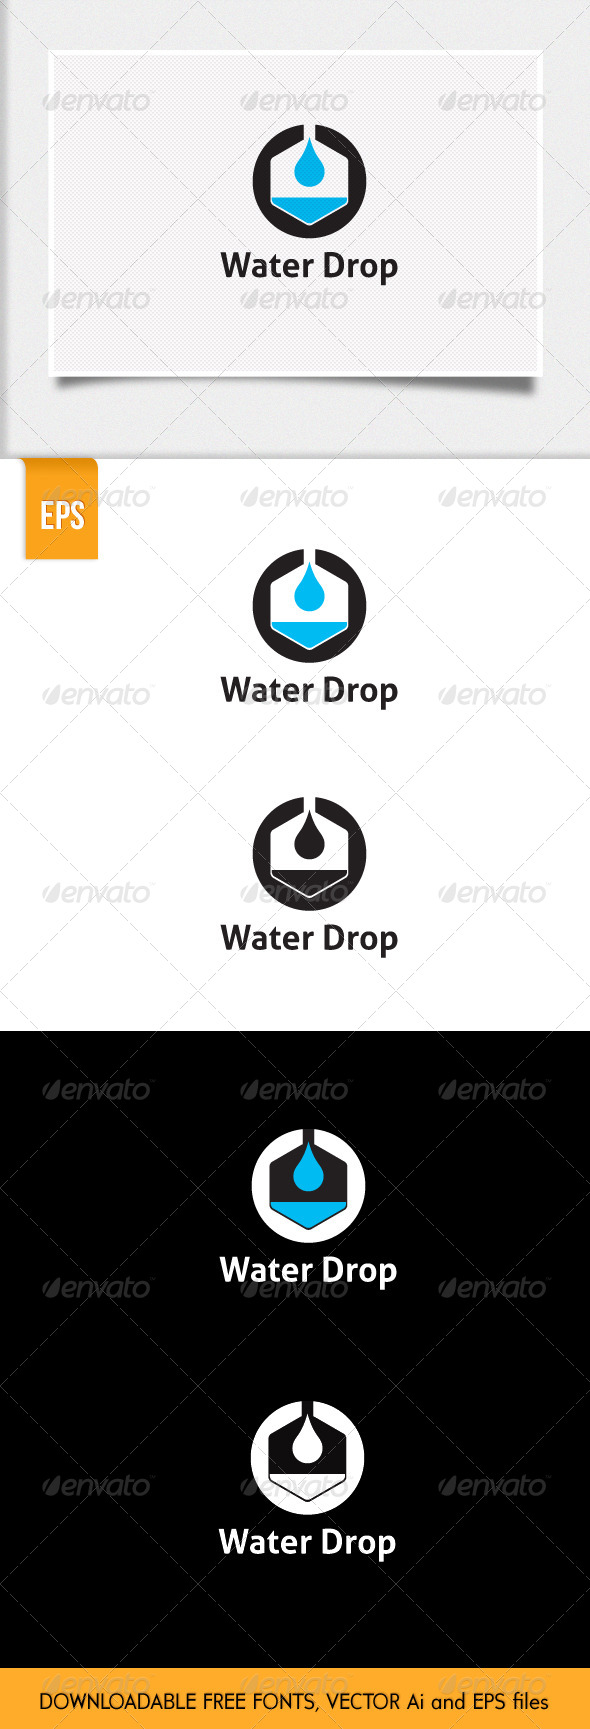 GraphicRiver Water Drop Logo 5824956